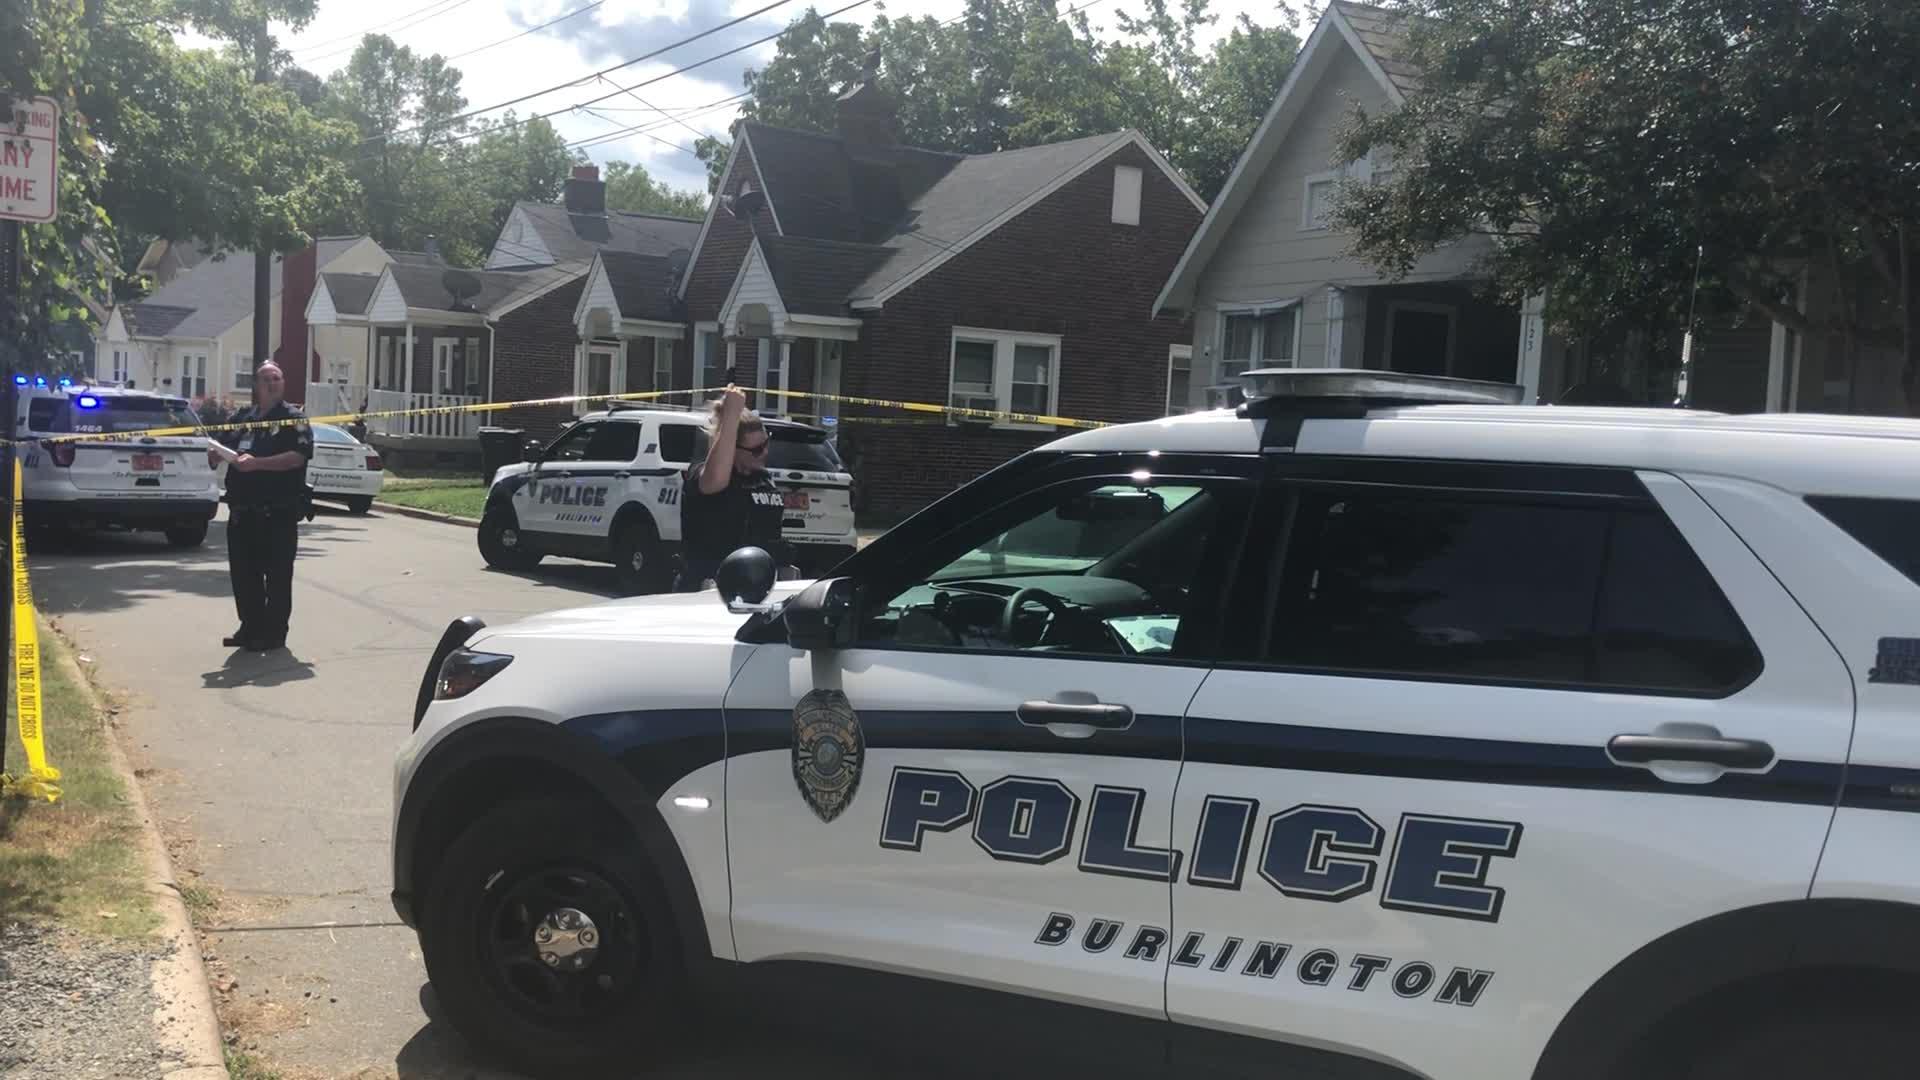 Investigation underway in Burlington